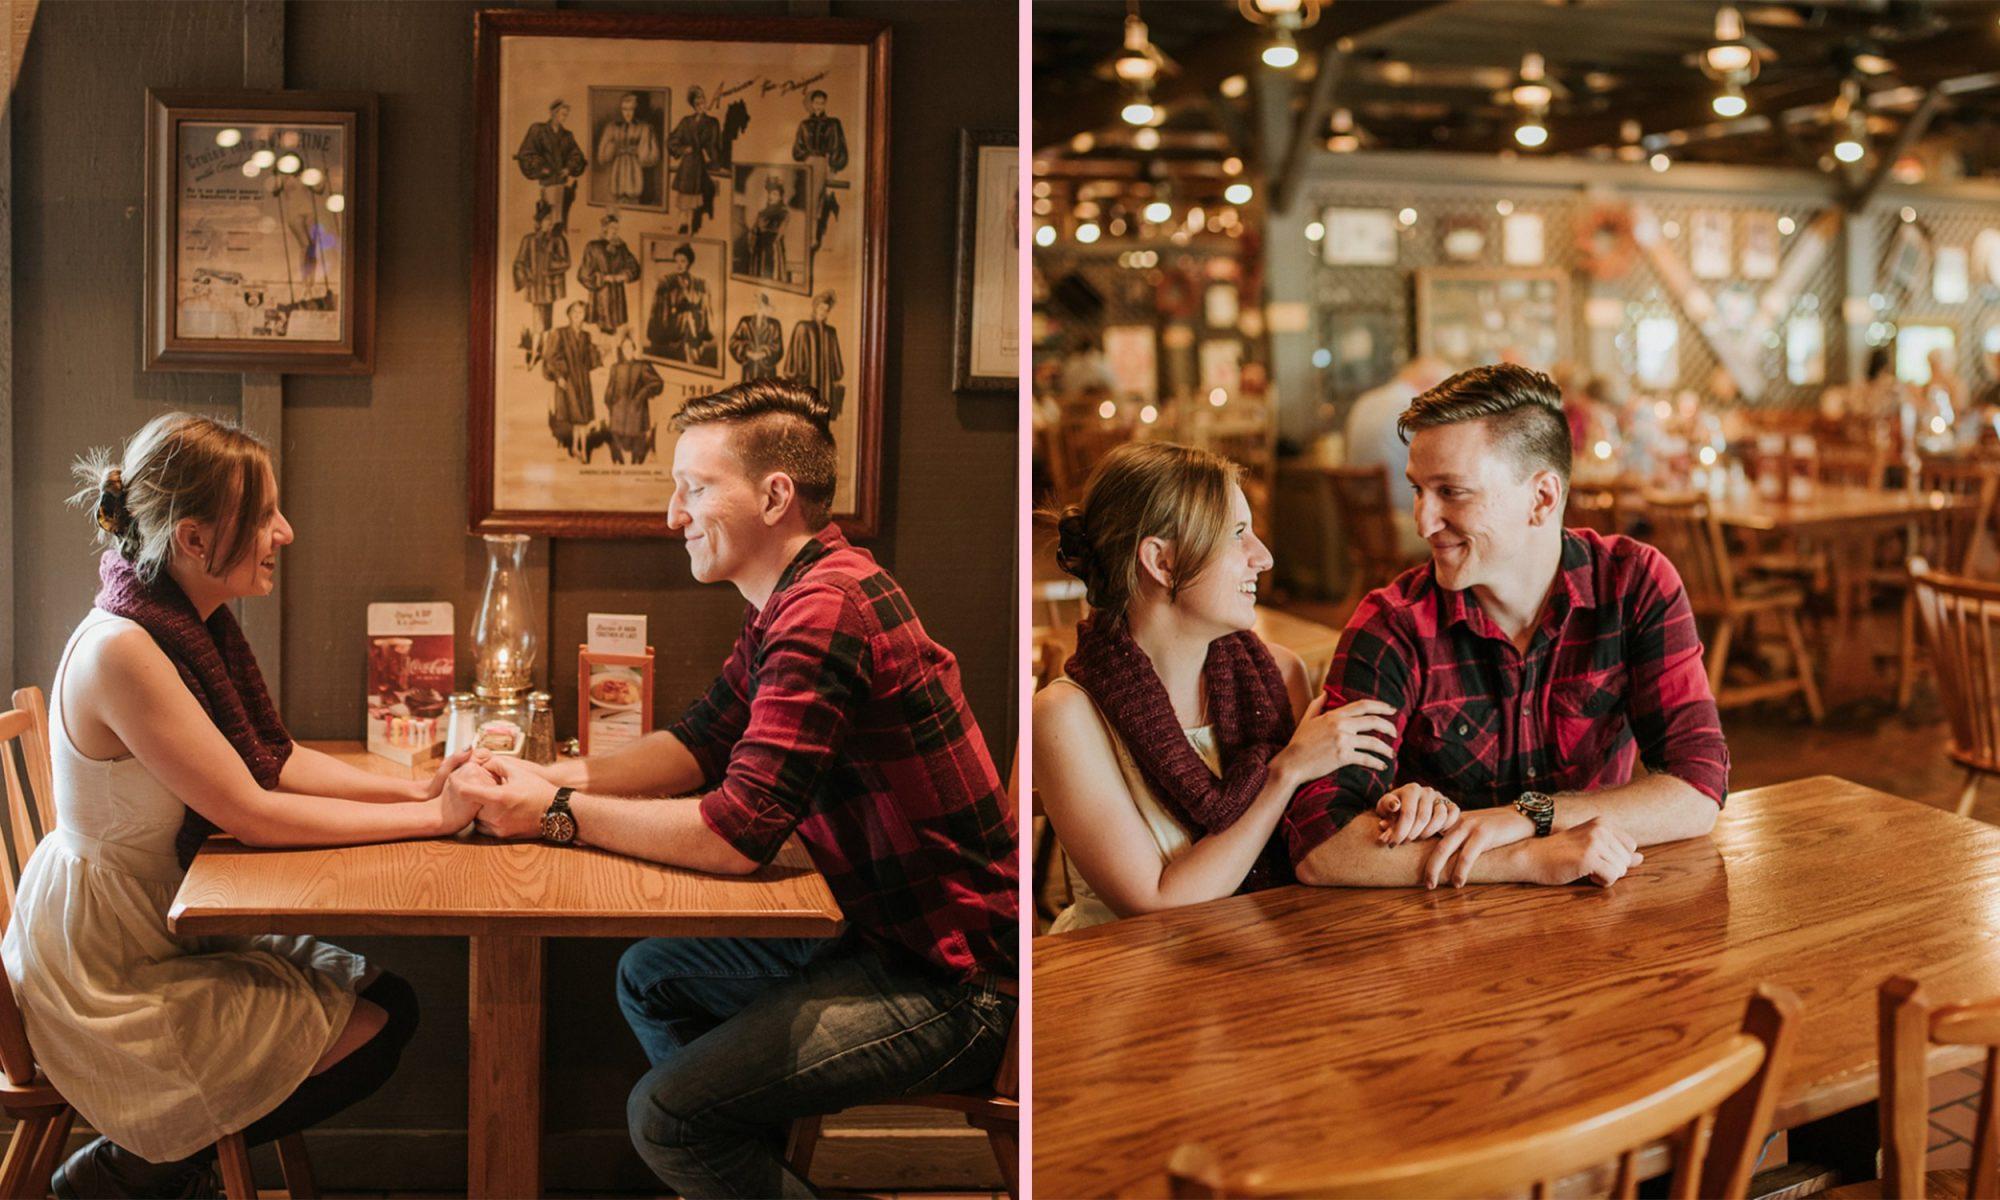 EC: This Couple Shot Their Engagement Photos at a Cracker Barrel